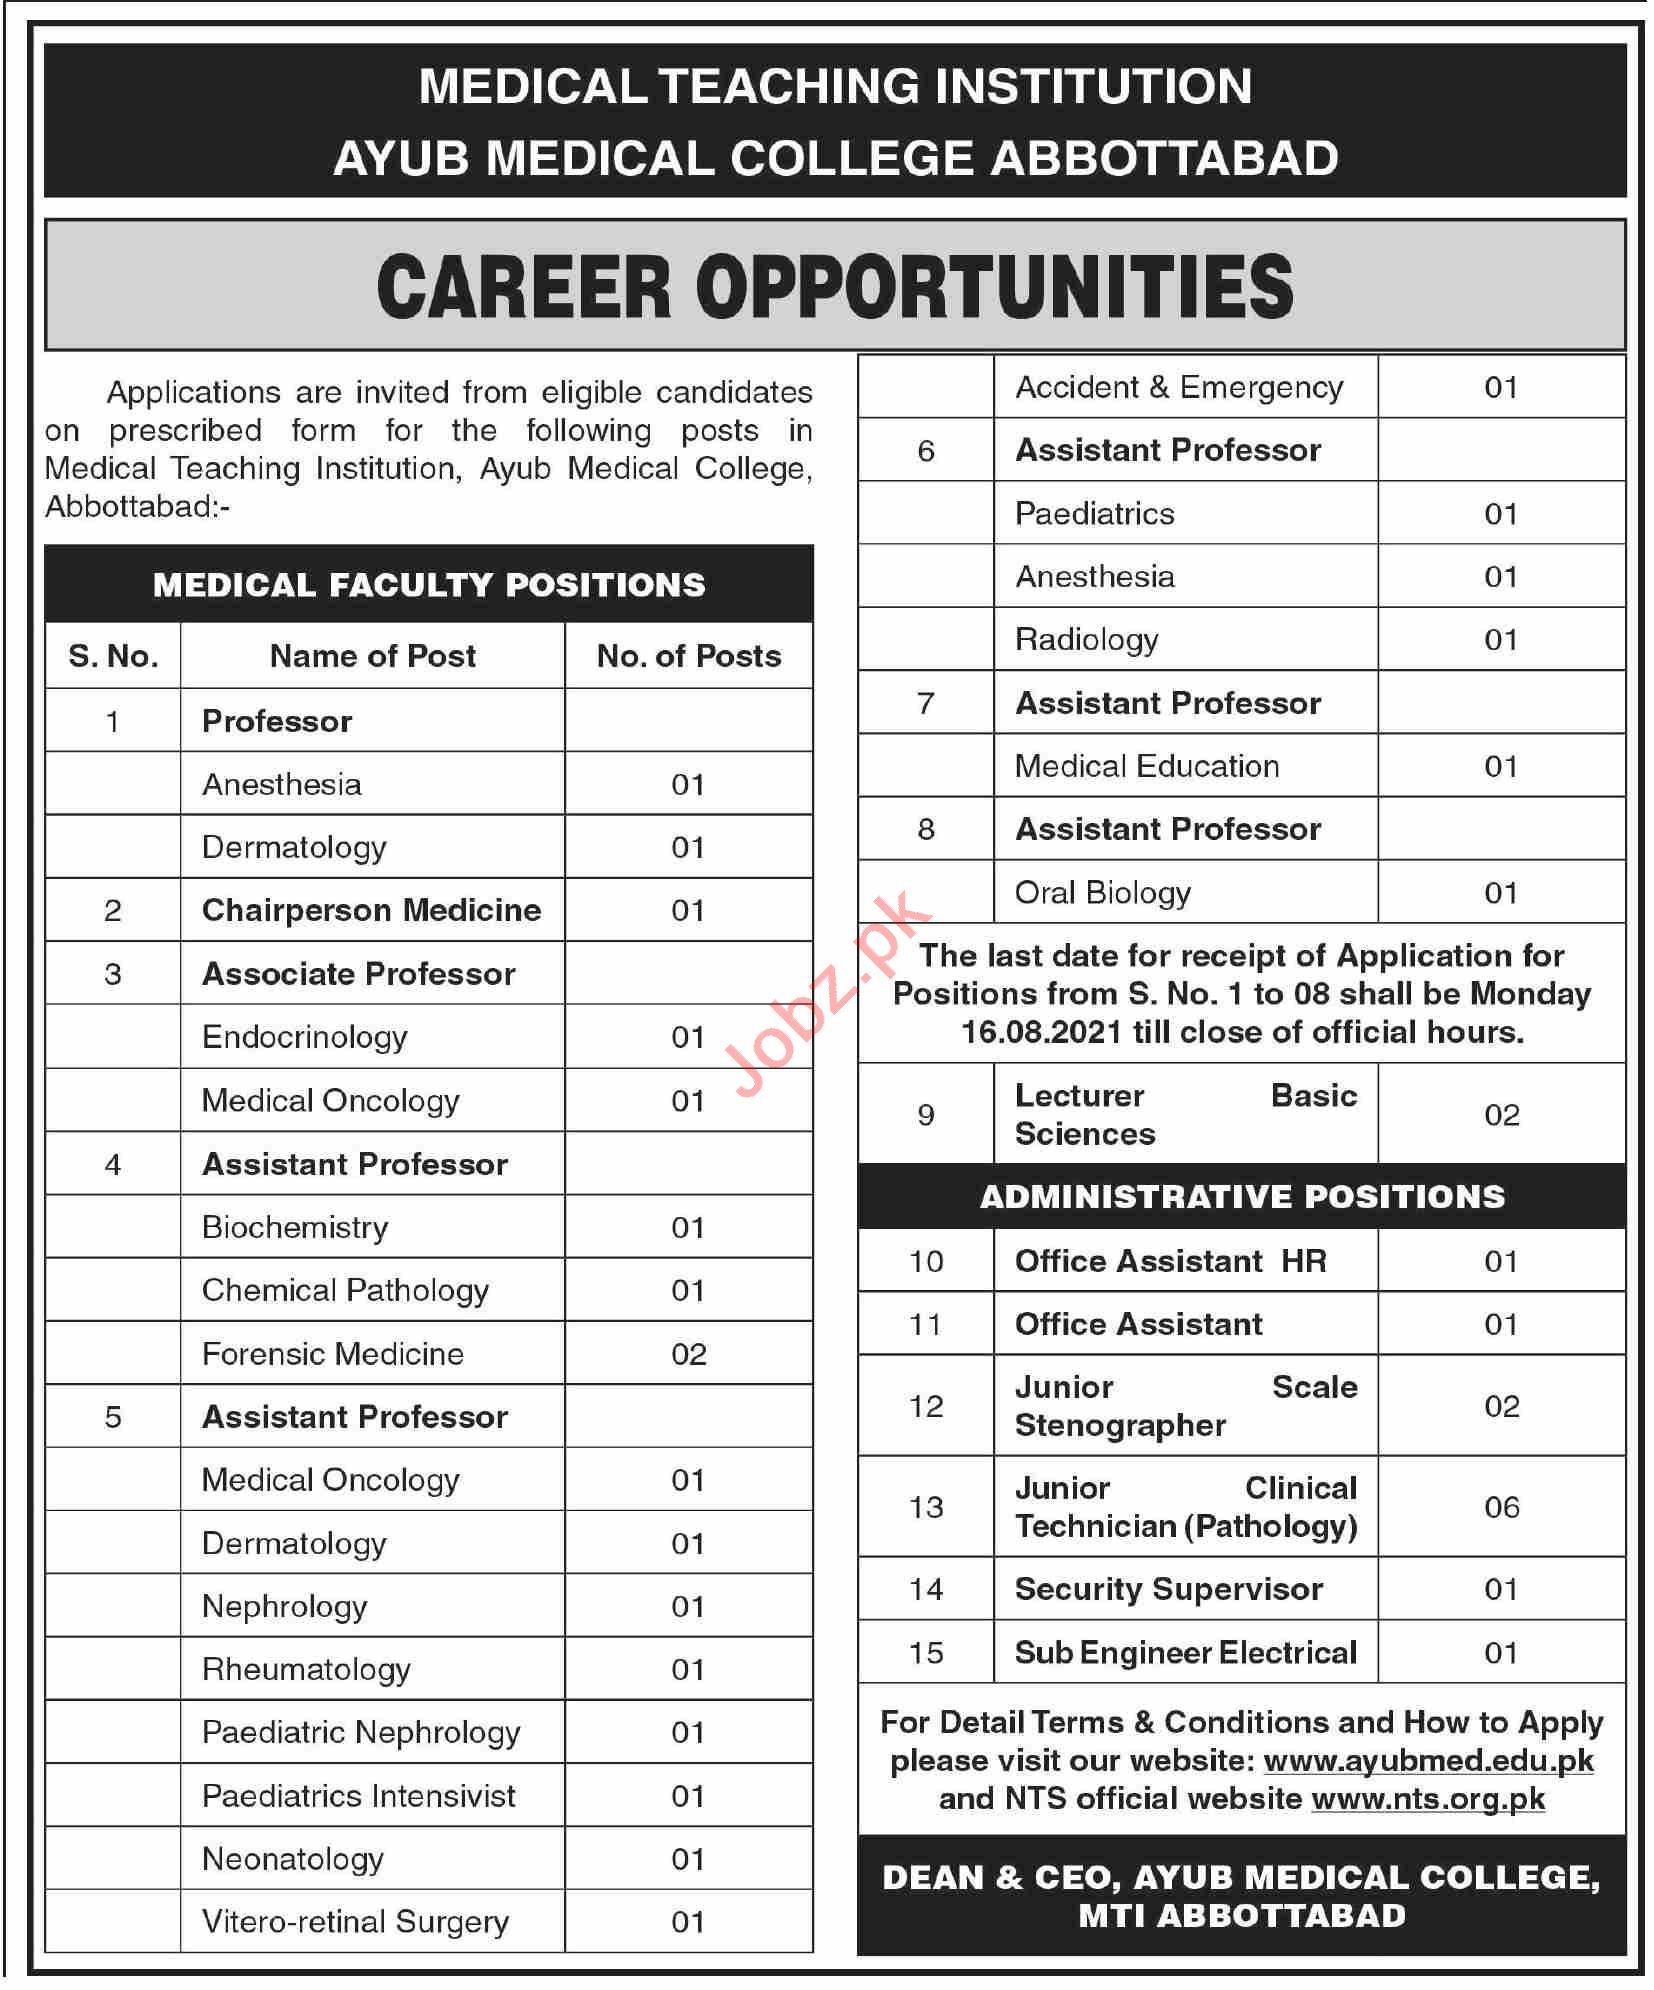 Ayub Medical College AMC Abbottabad Jobs 2021 for Professors